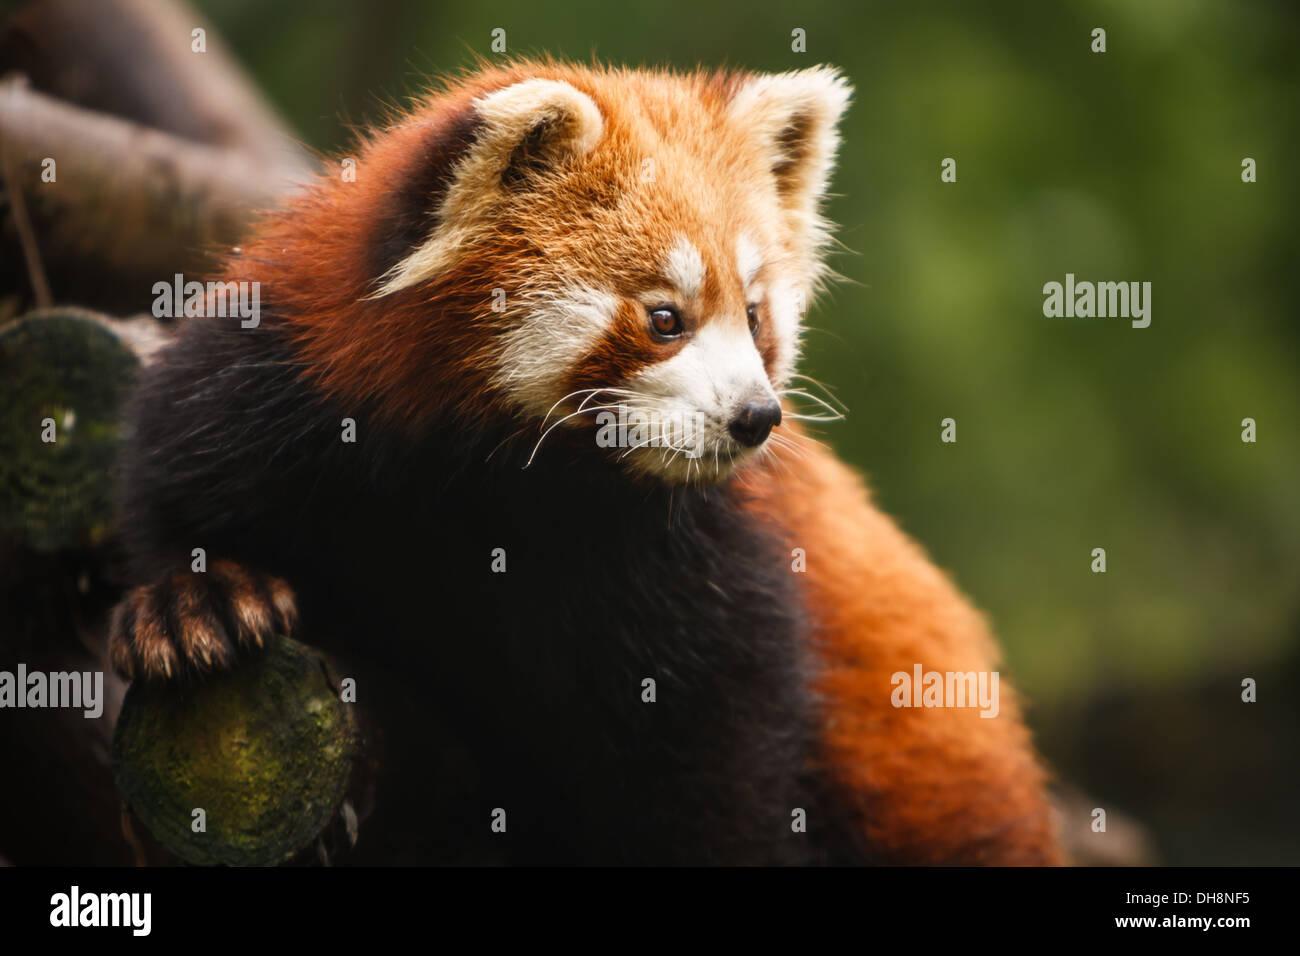 Red panda bear climbing tree at Chengdu Research Base of Giant Panda Breeding Center in Sichuan China - Stock Image